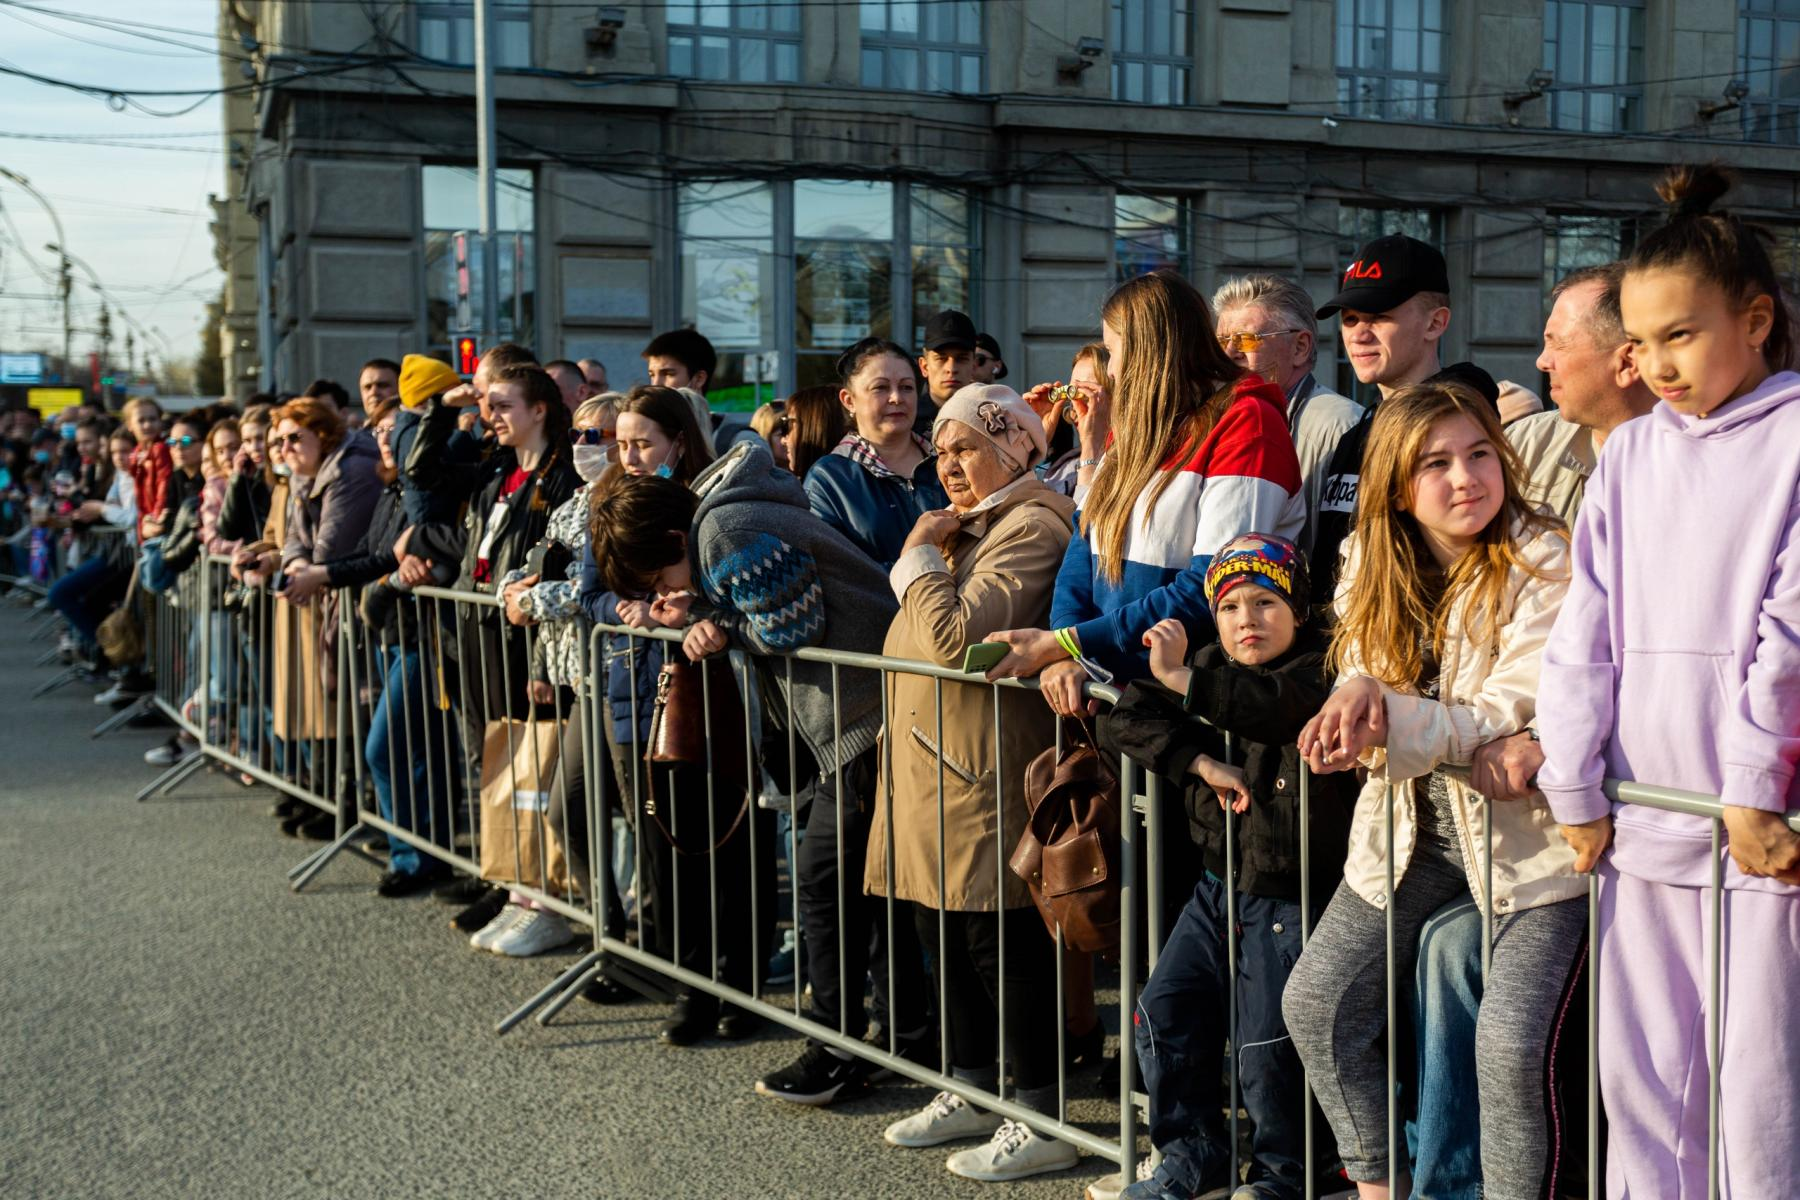 Фото Флаги, форма, техника, толпы зрителей: лучшие фото с репетиции парада в Новосибирске 5